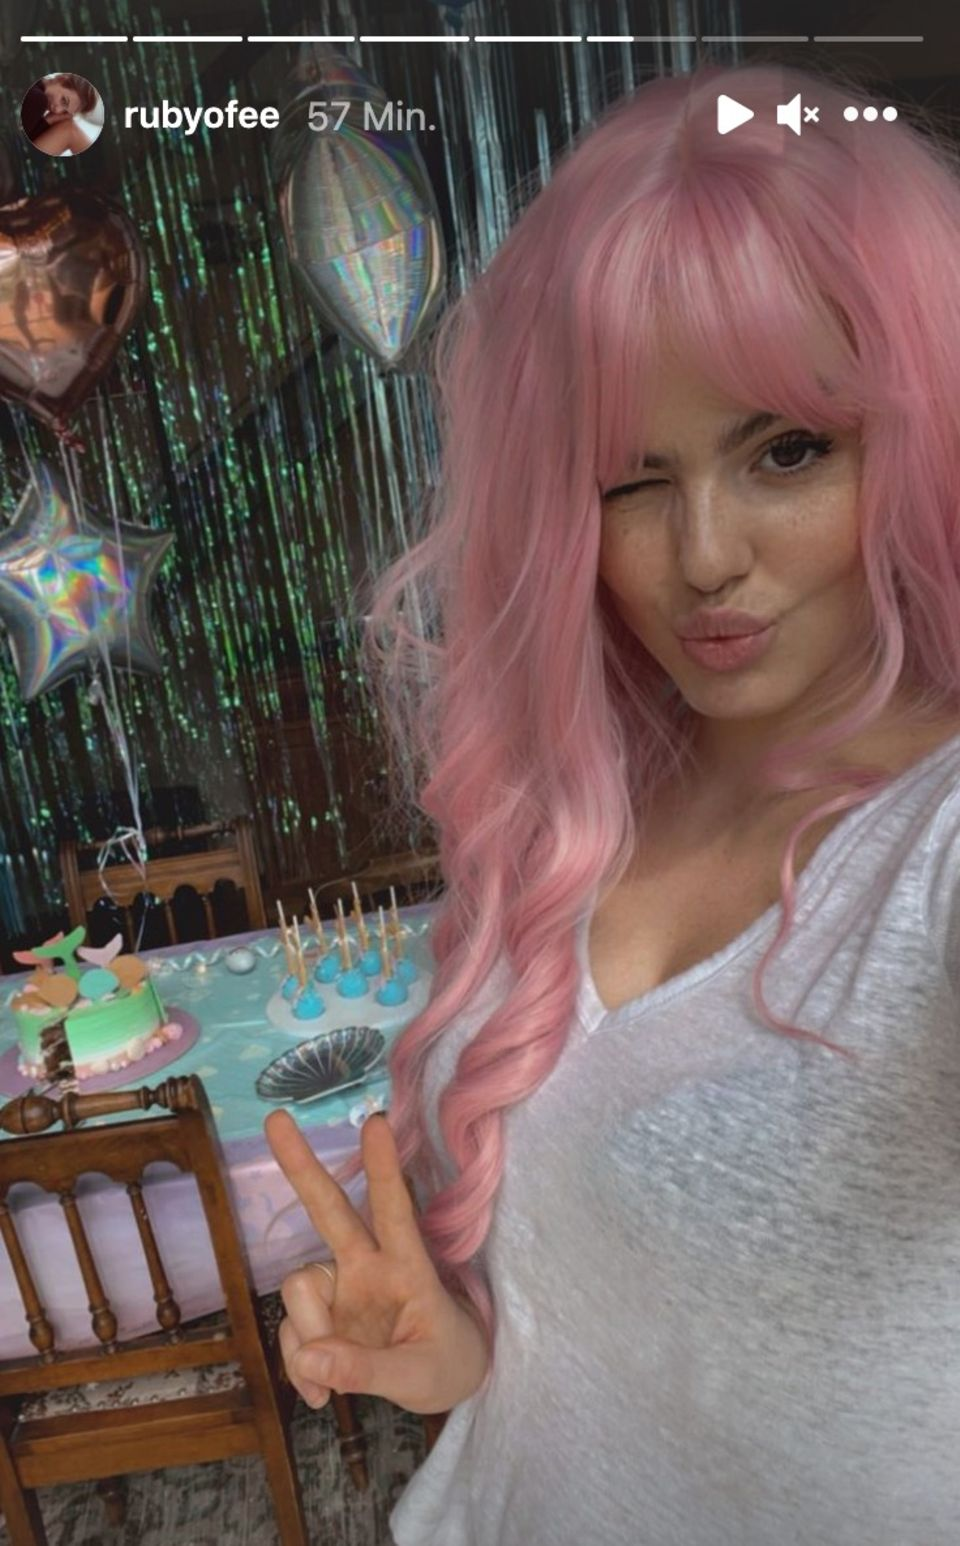 Ruby O.Fee bei Gretas Geburtstagsparty